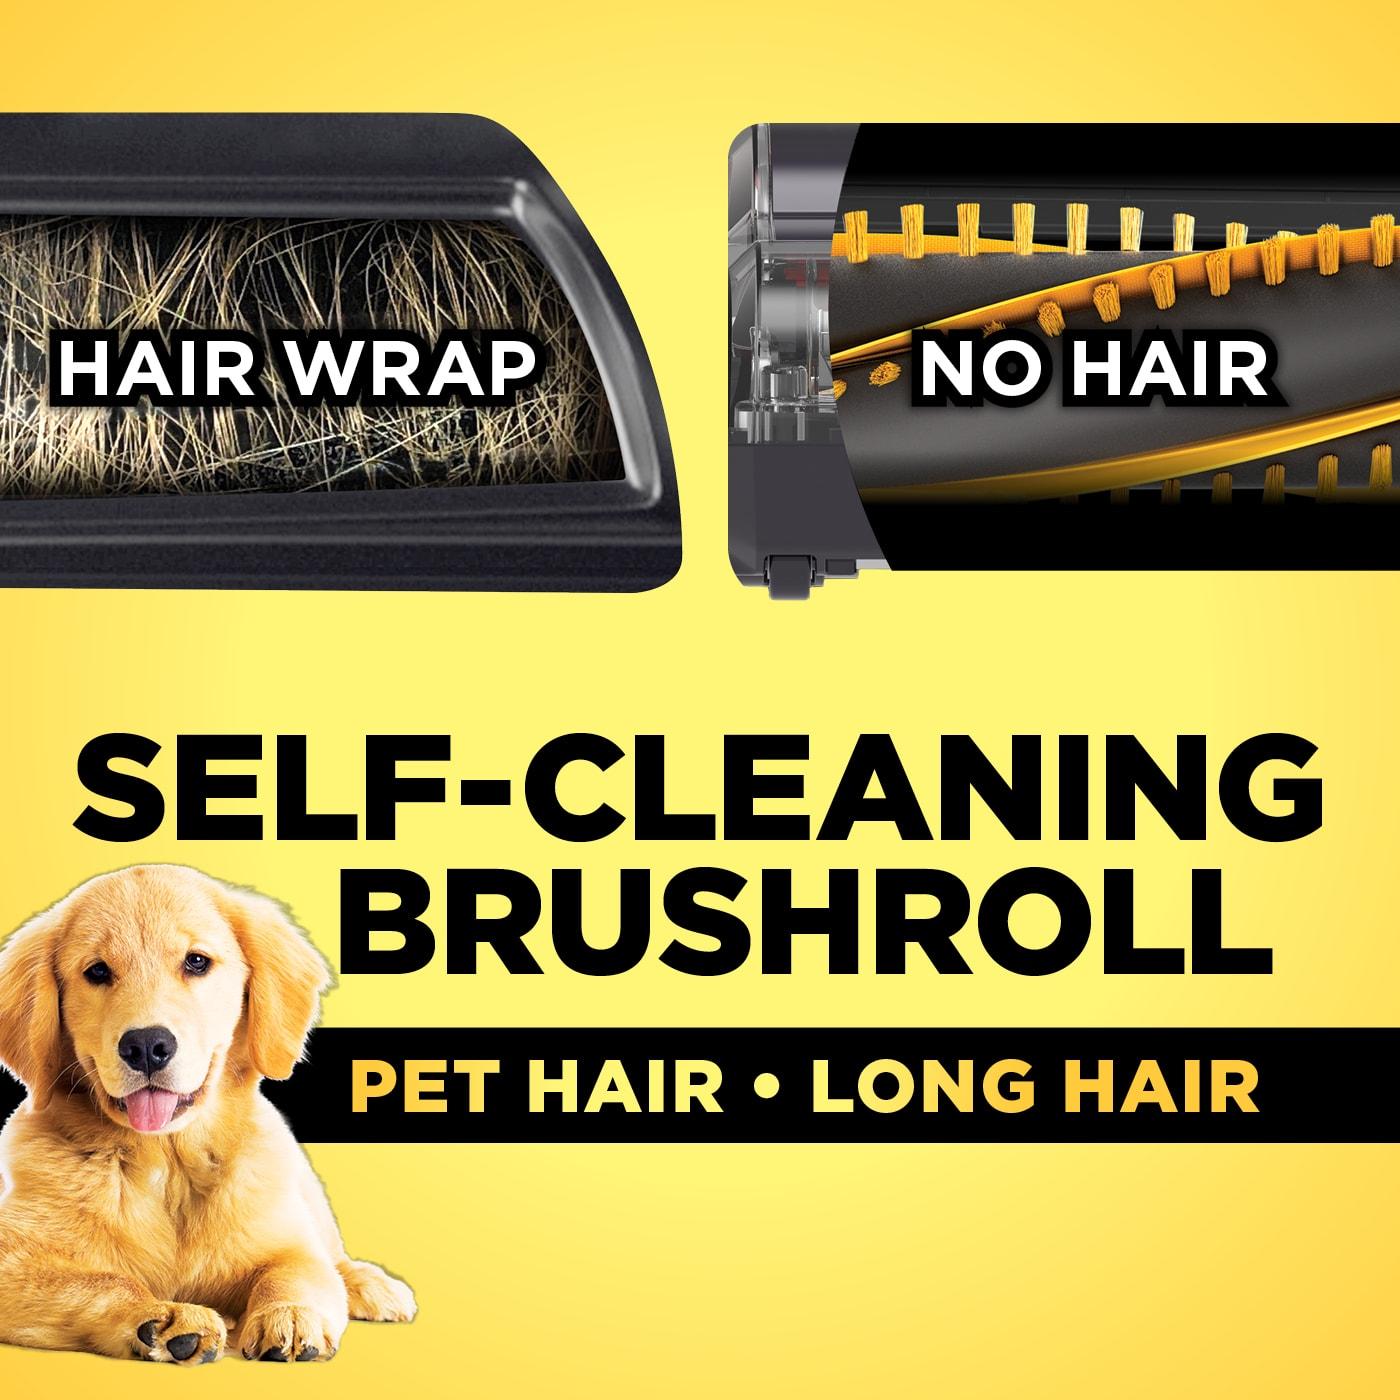 Self-cleaning brushroll